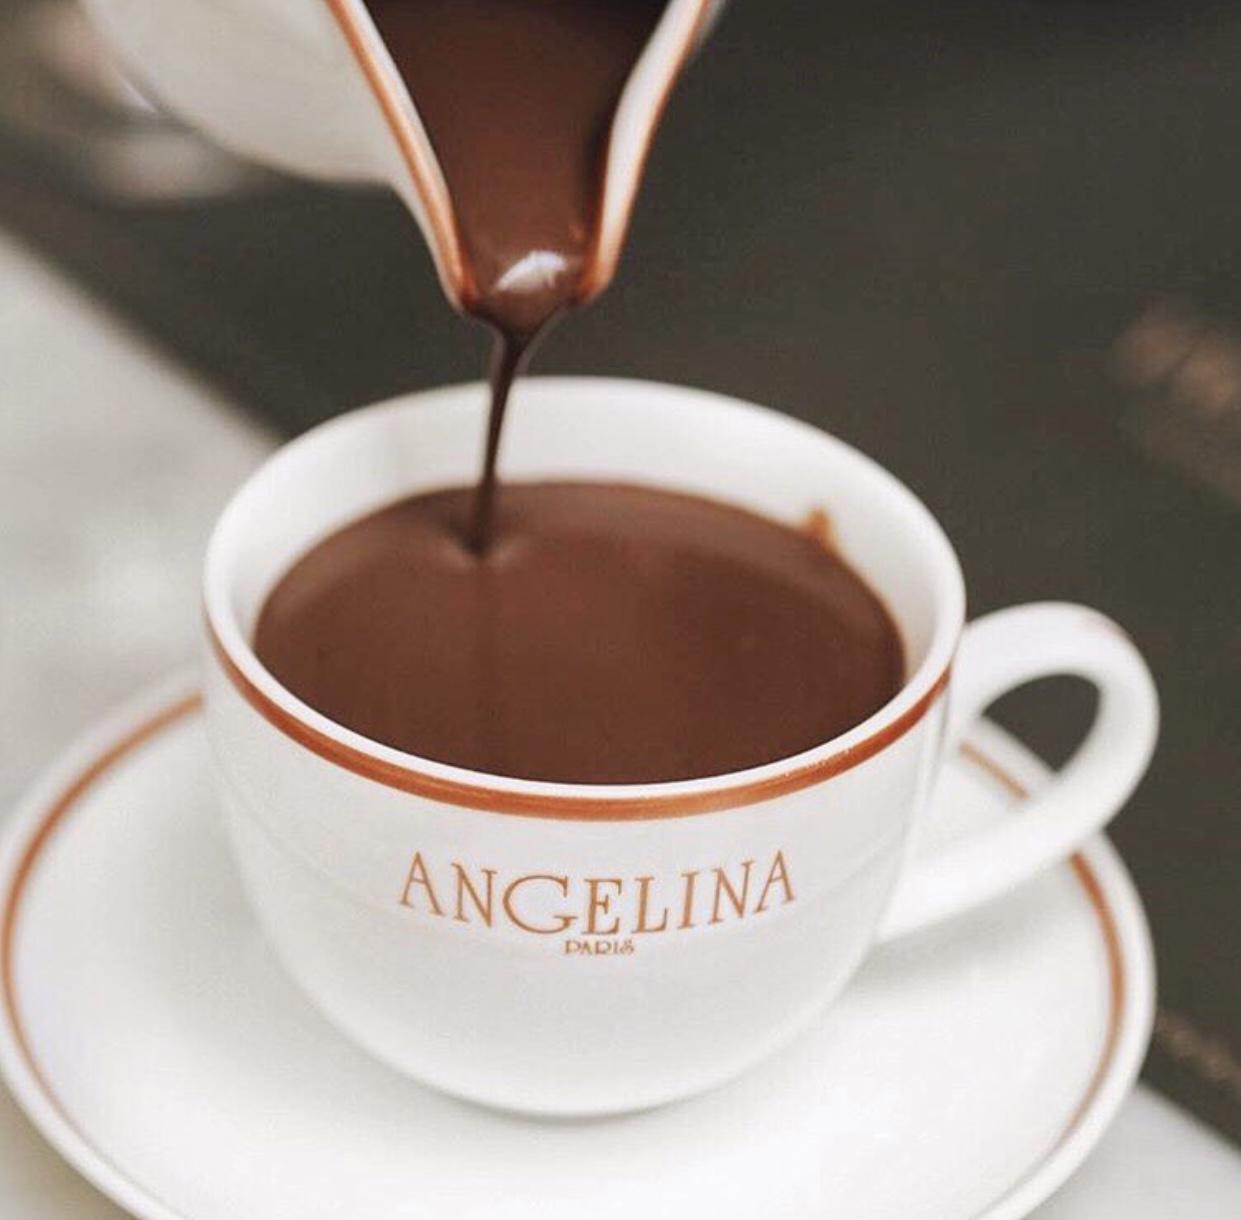 Como servir o chocolate quente Angelina?